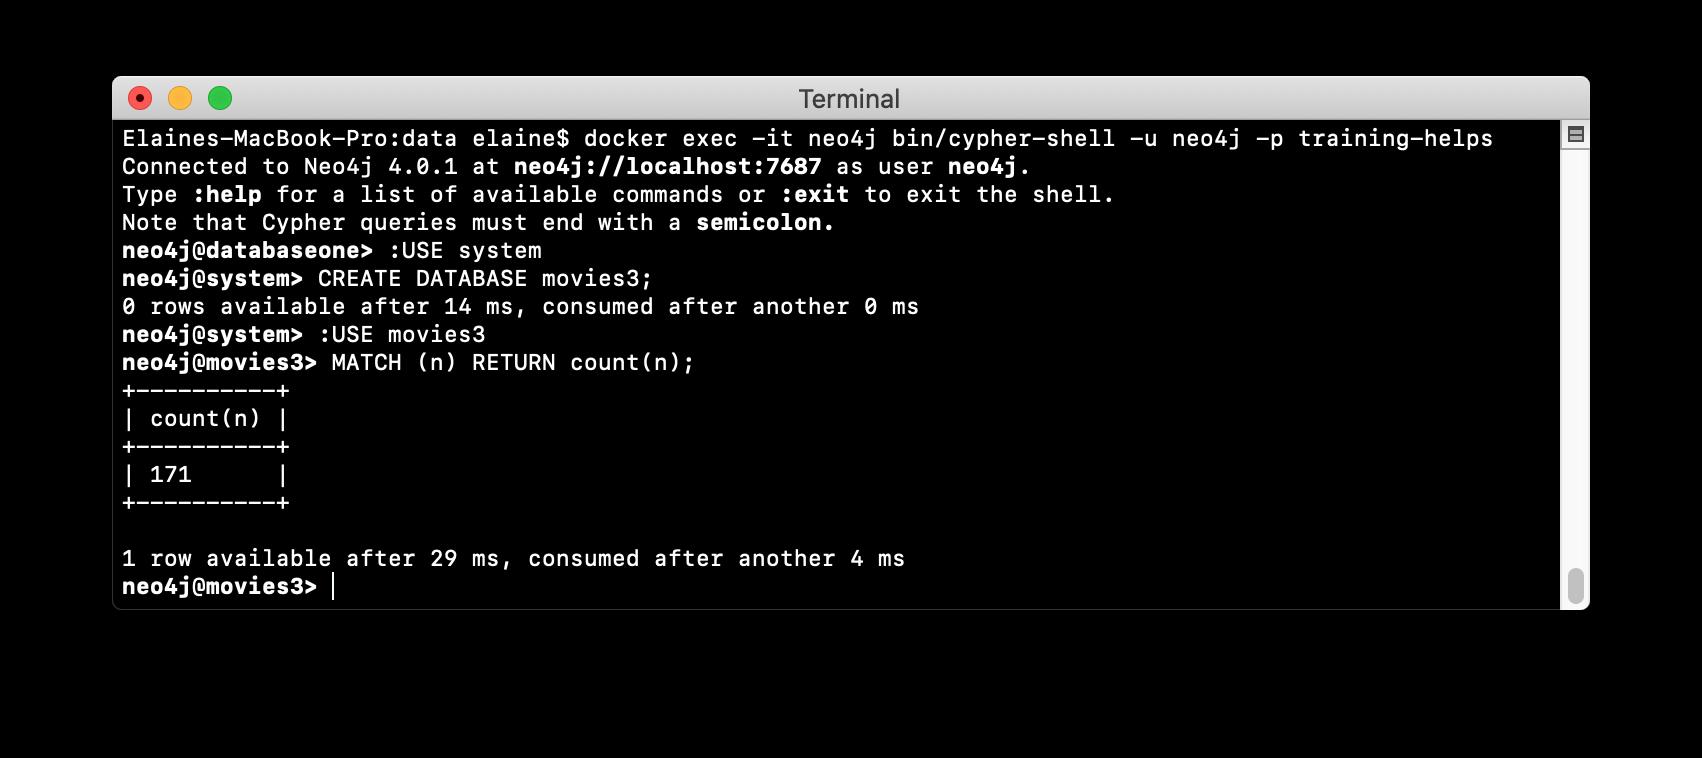 Verify-neo4j-adminLoadDocker